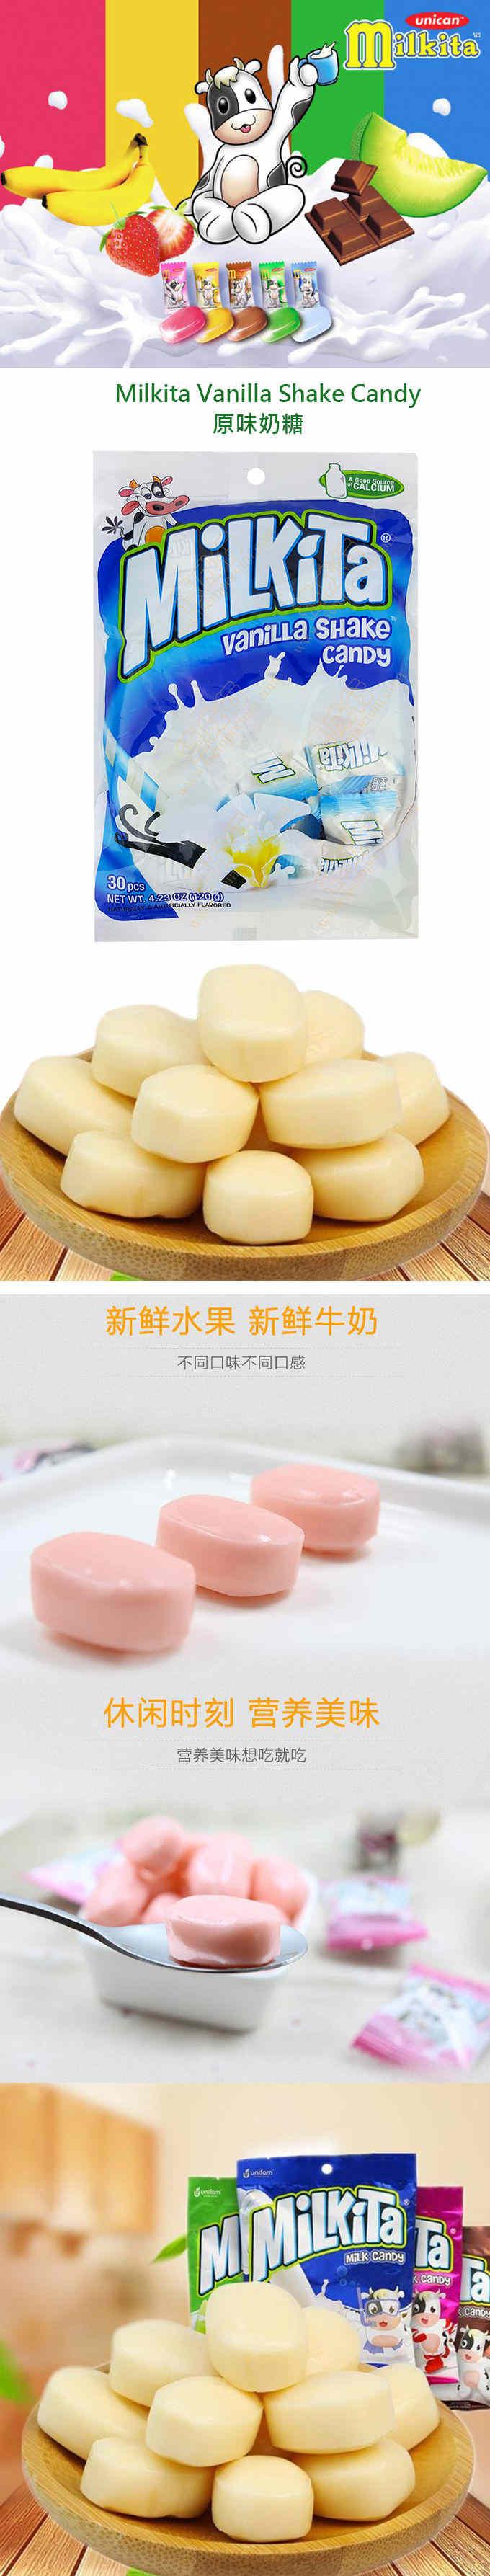 Milkita 原味奶糖120g - 美国德成行